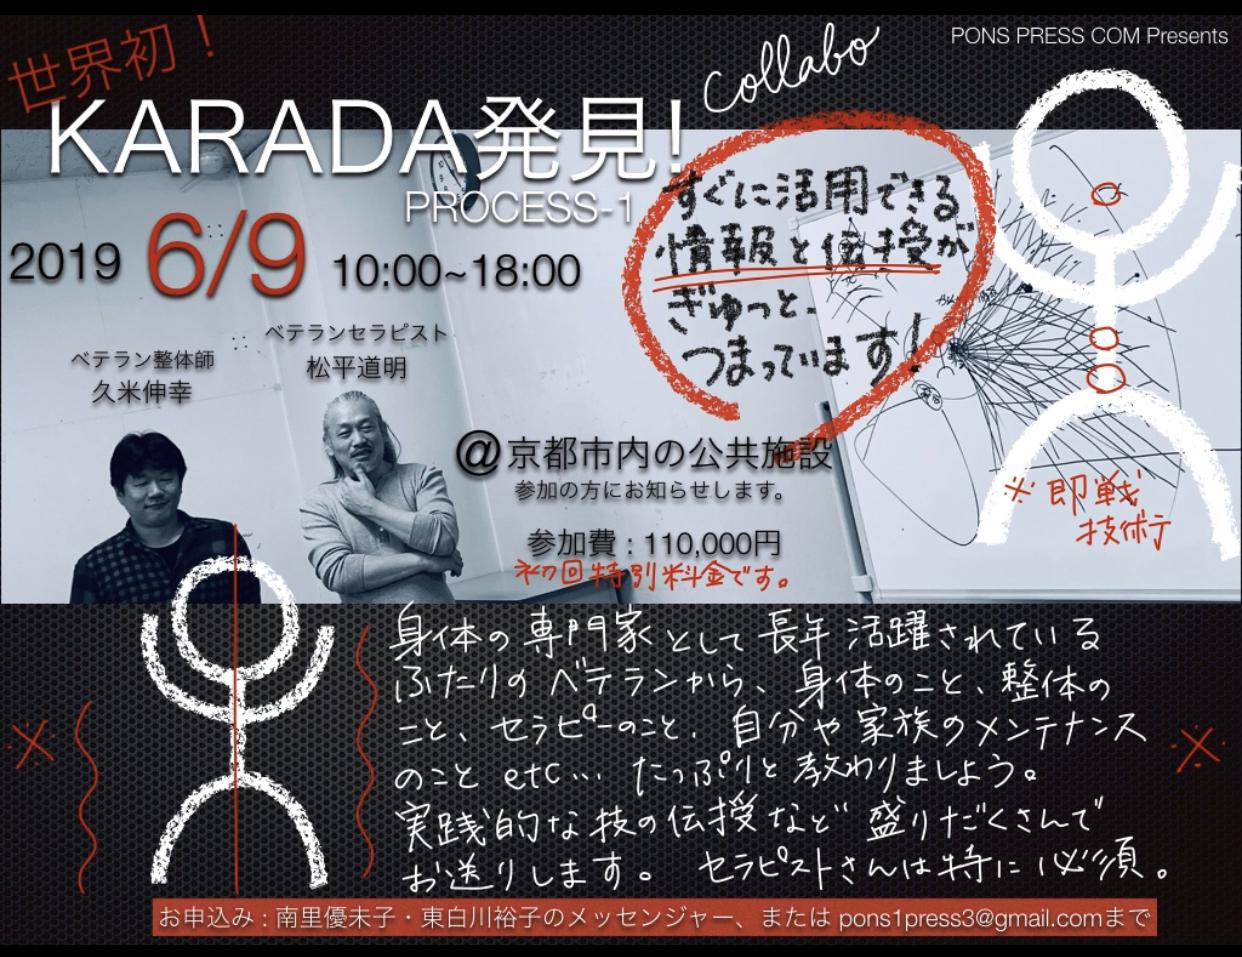 2019/6/9 KARADA発見@京都